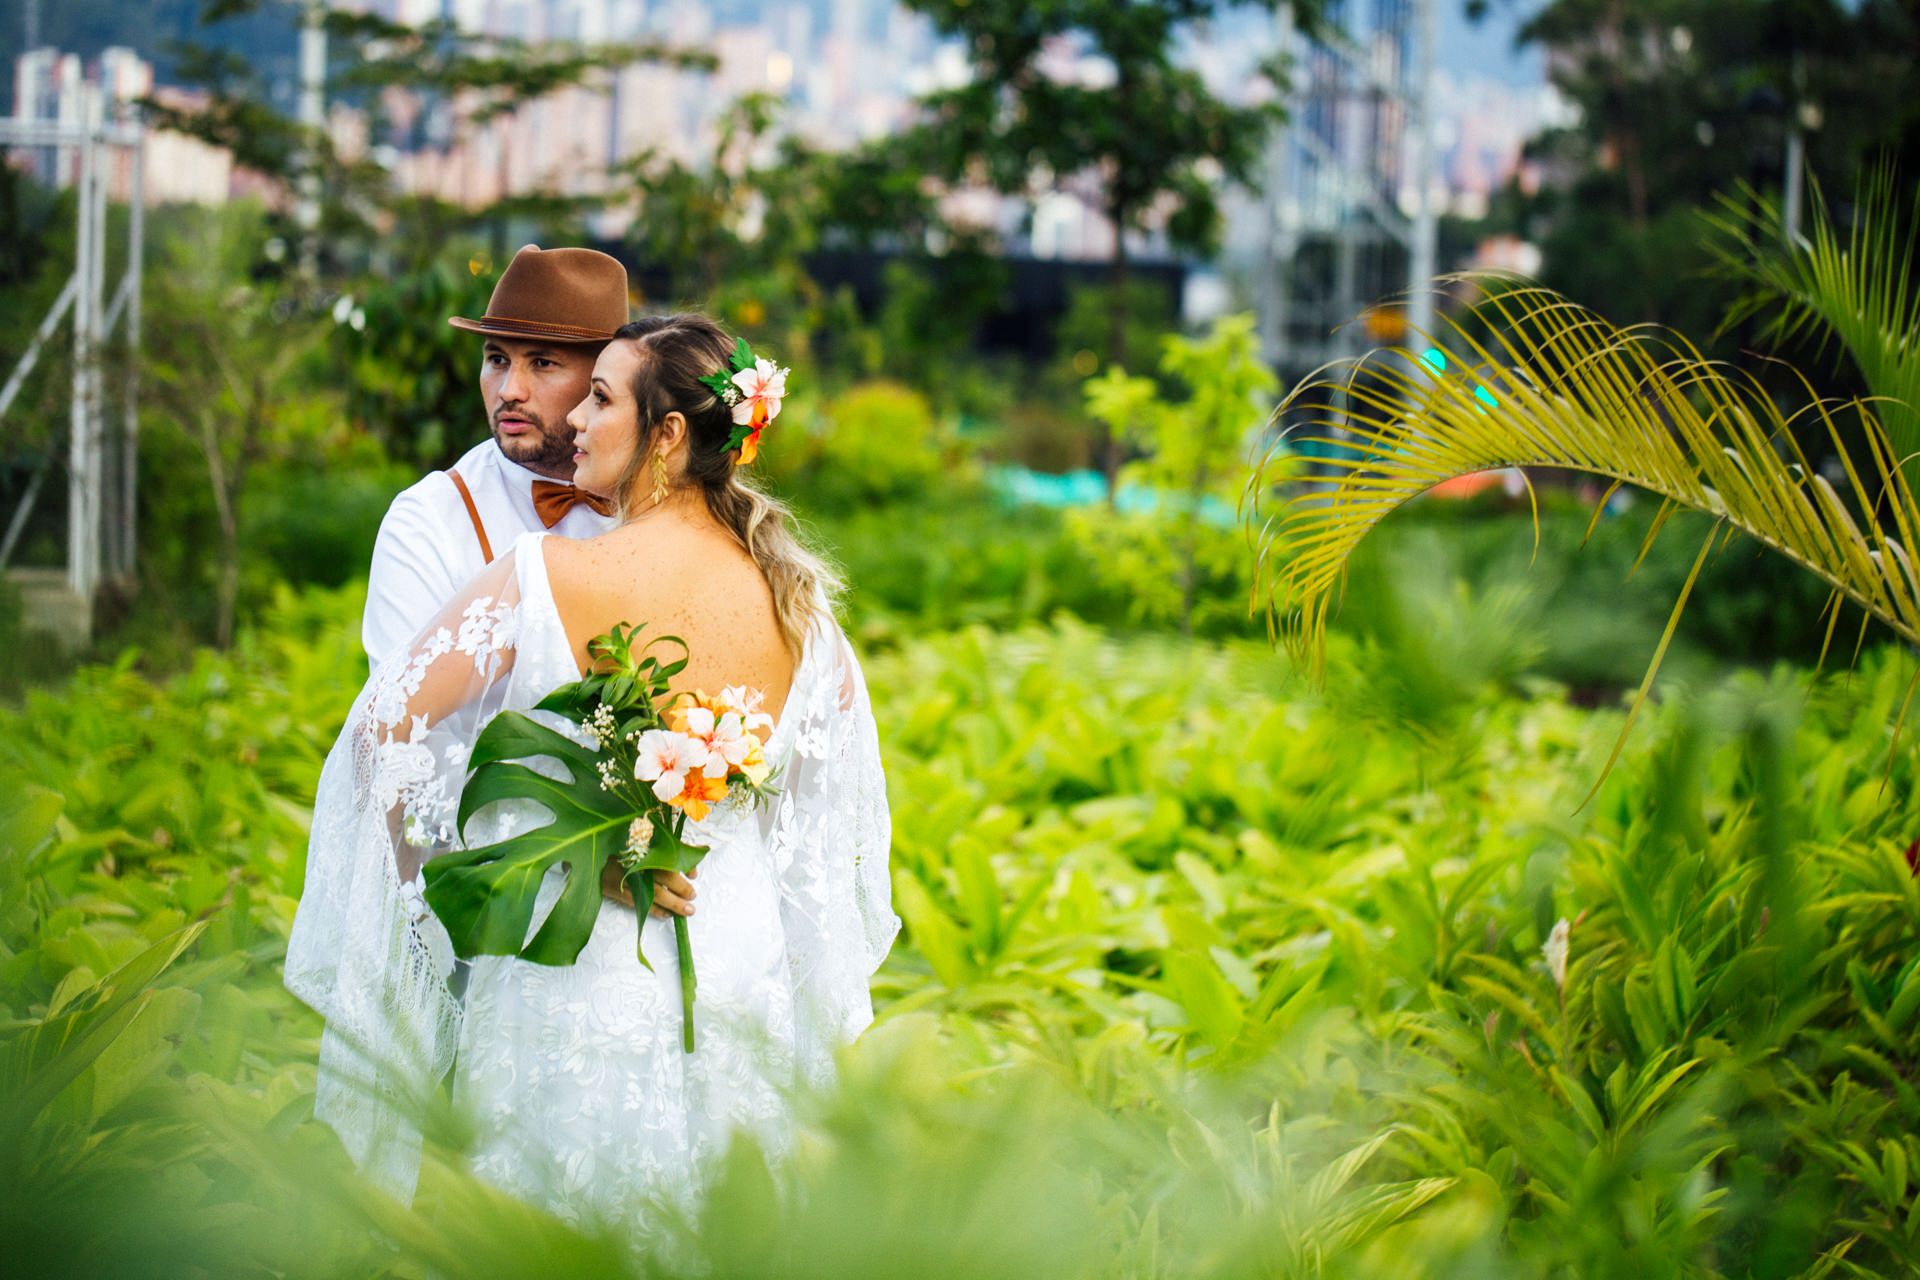 Wedding-Boda-Matrimonio-Fotografo-Fotografia-bodas-Medellin-Llanogrande-Colombia-Bogota-Cartagena-Miami-Wed-Destination-Photojournalism (174).JPG